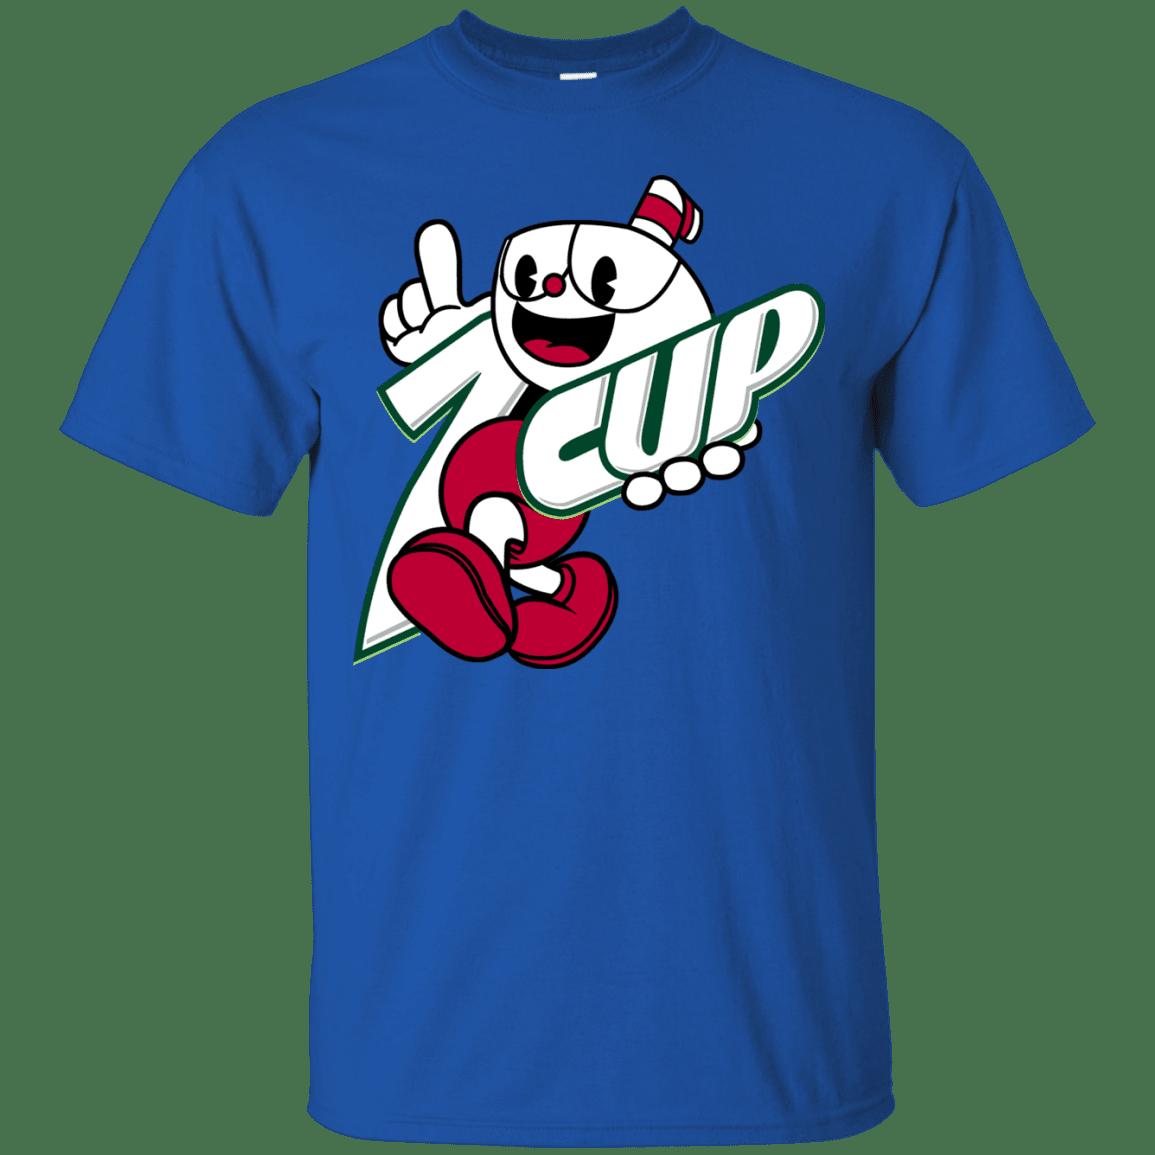 1cup Tshirt